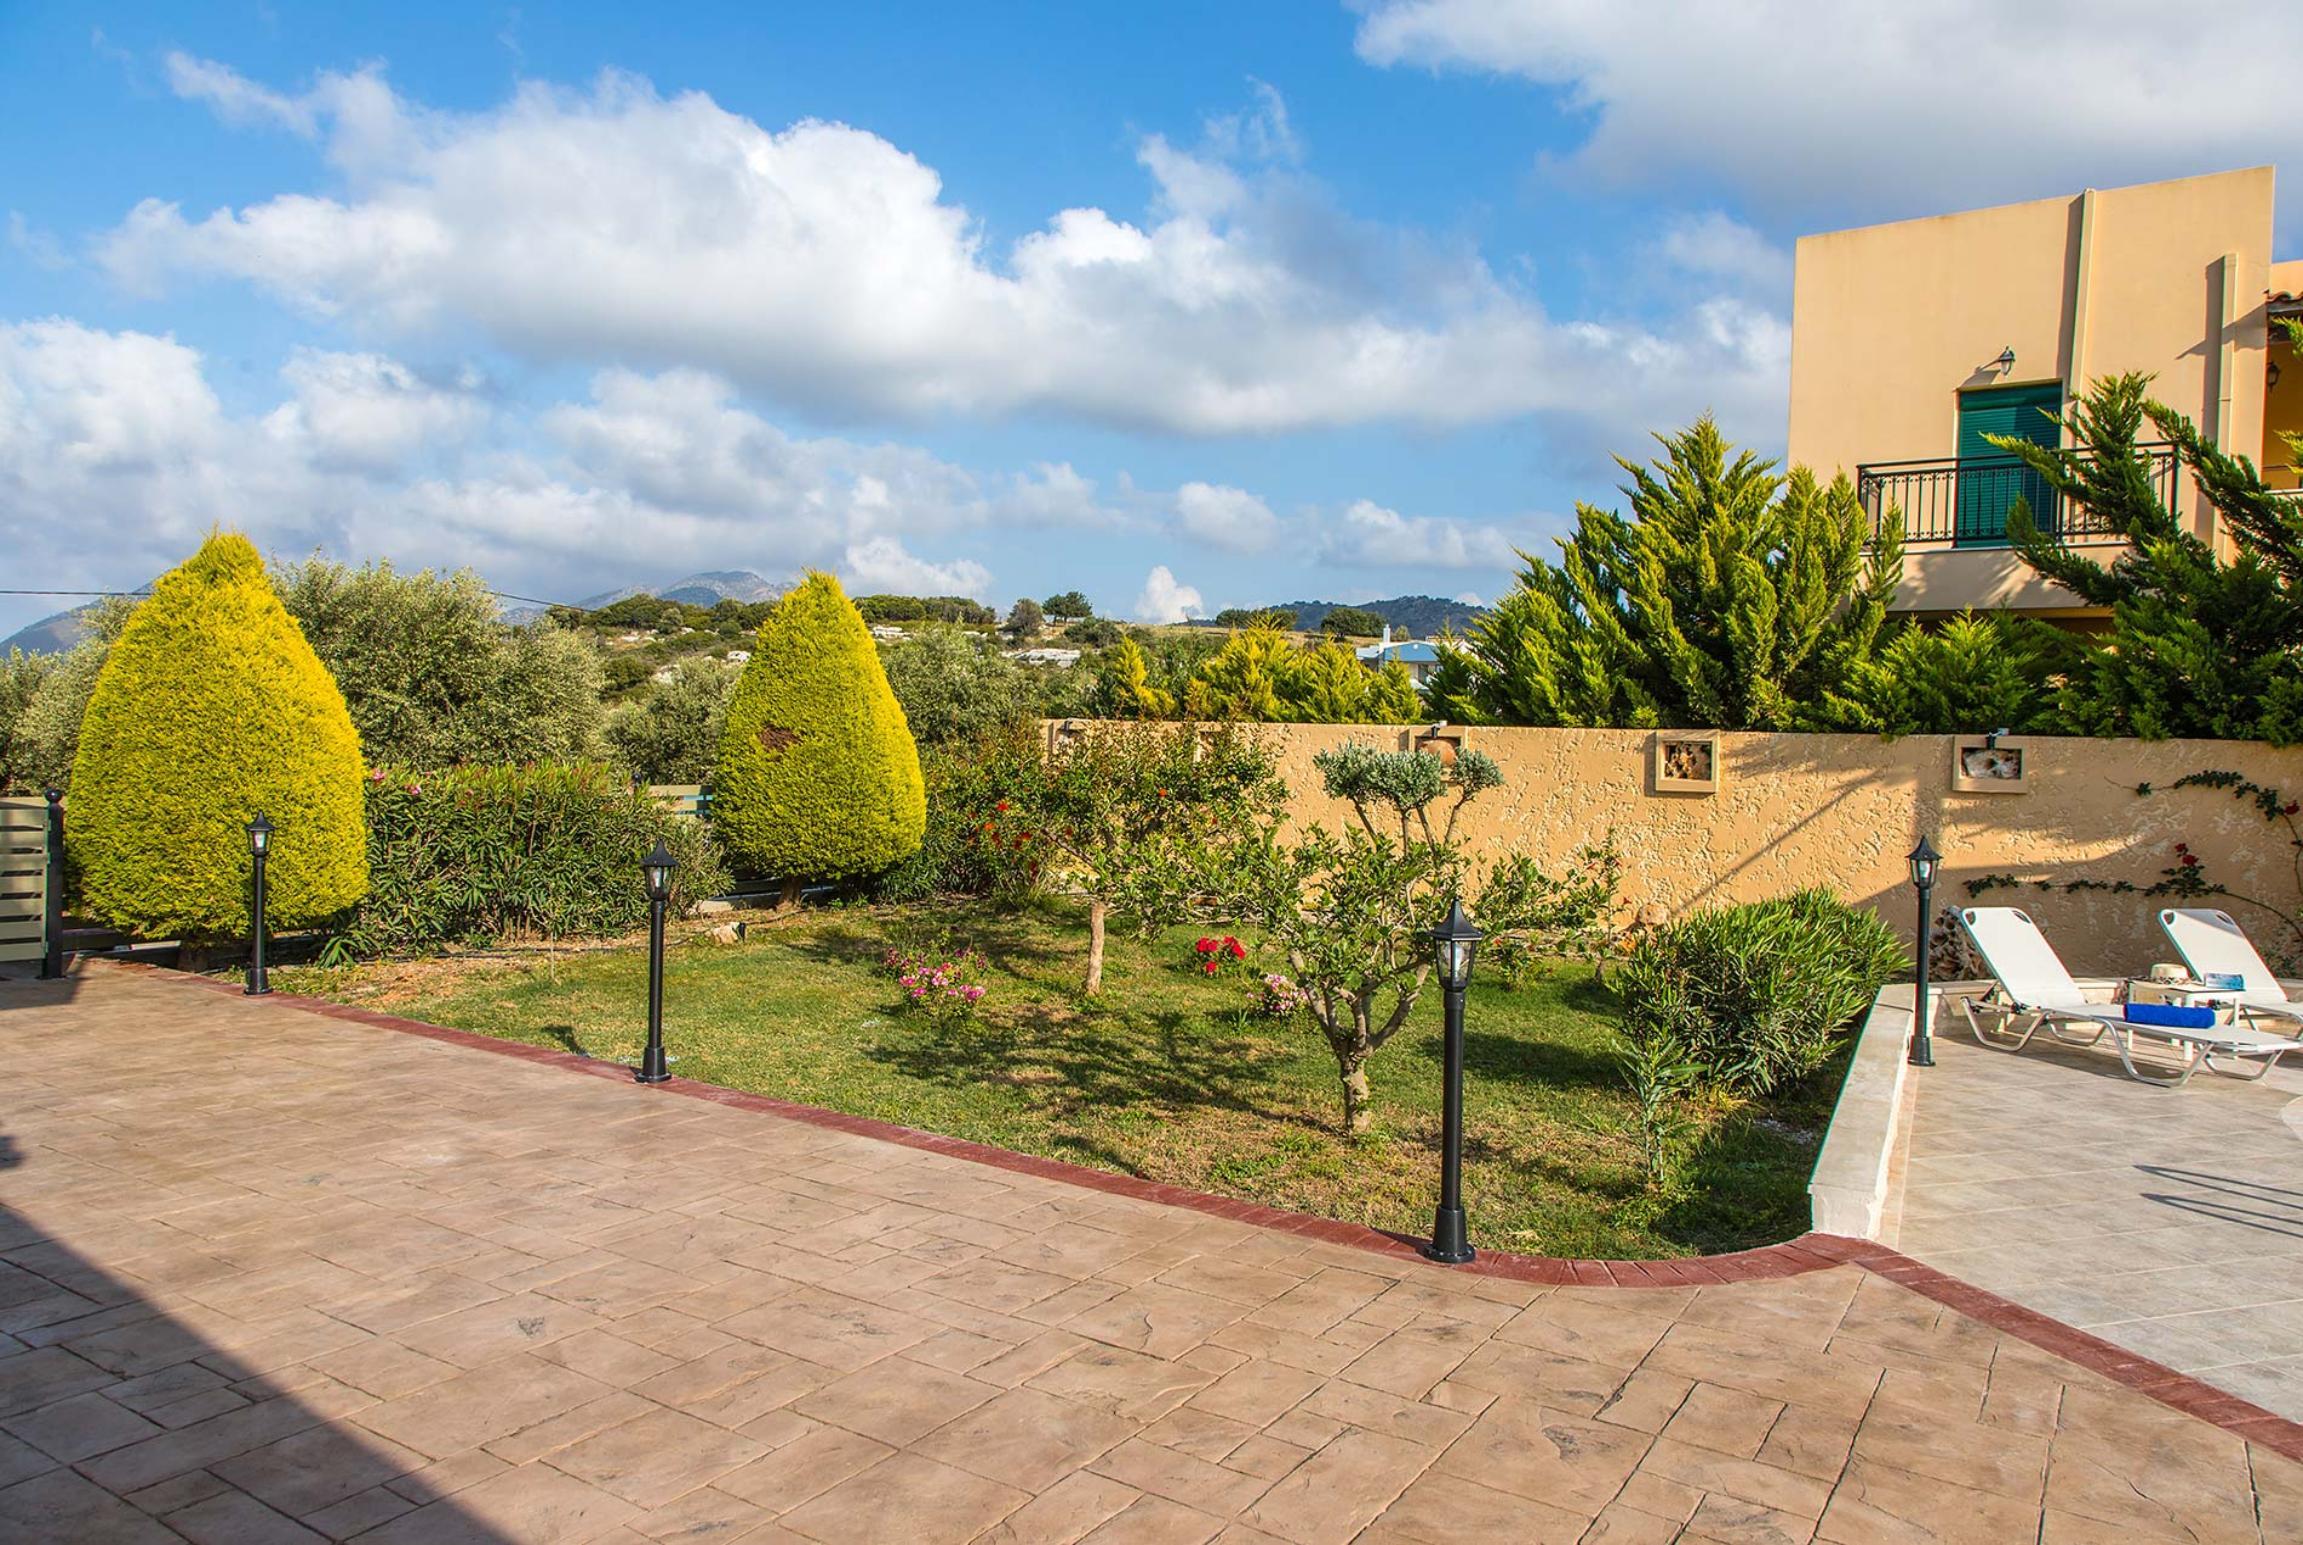 Ferienhaus Dina (2653758), Roumeli, Kreta Nordküste, Kreta, Griechenland, Bild 27